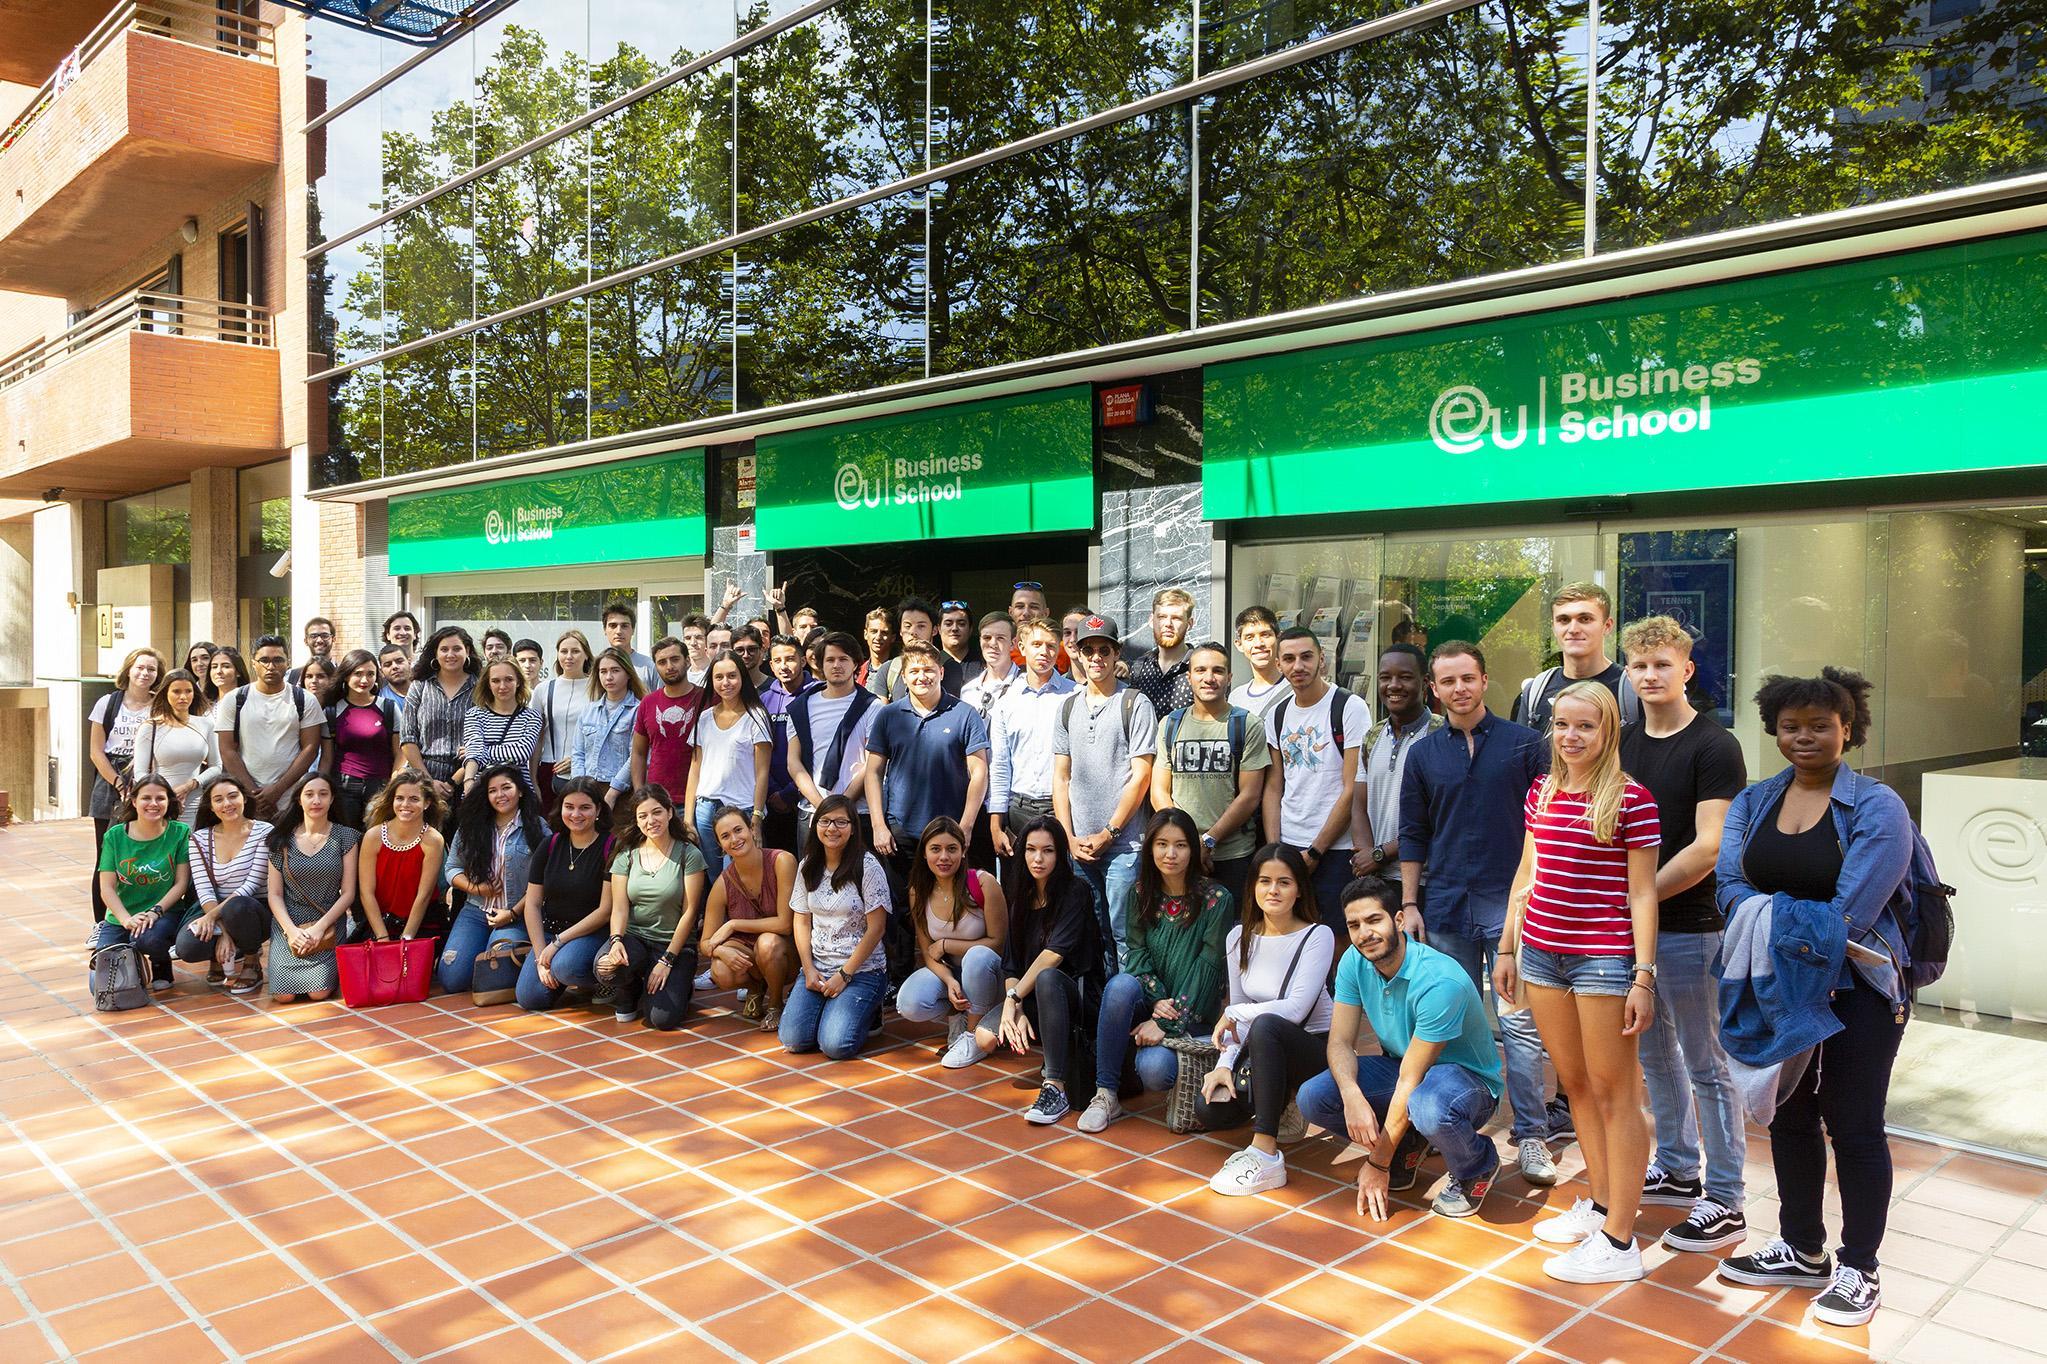 EU Business School - student life2